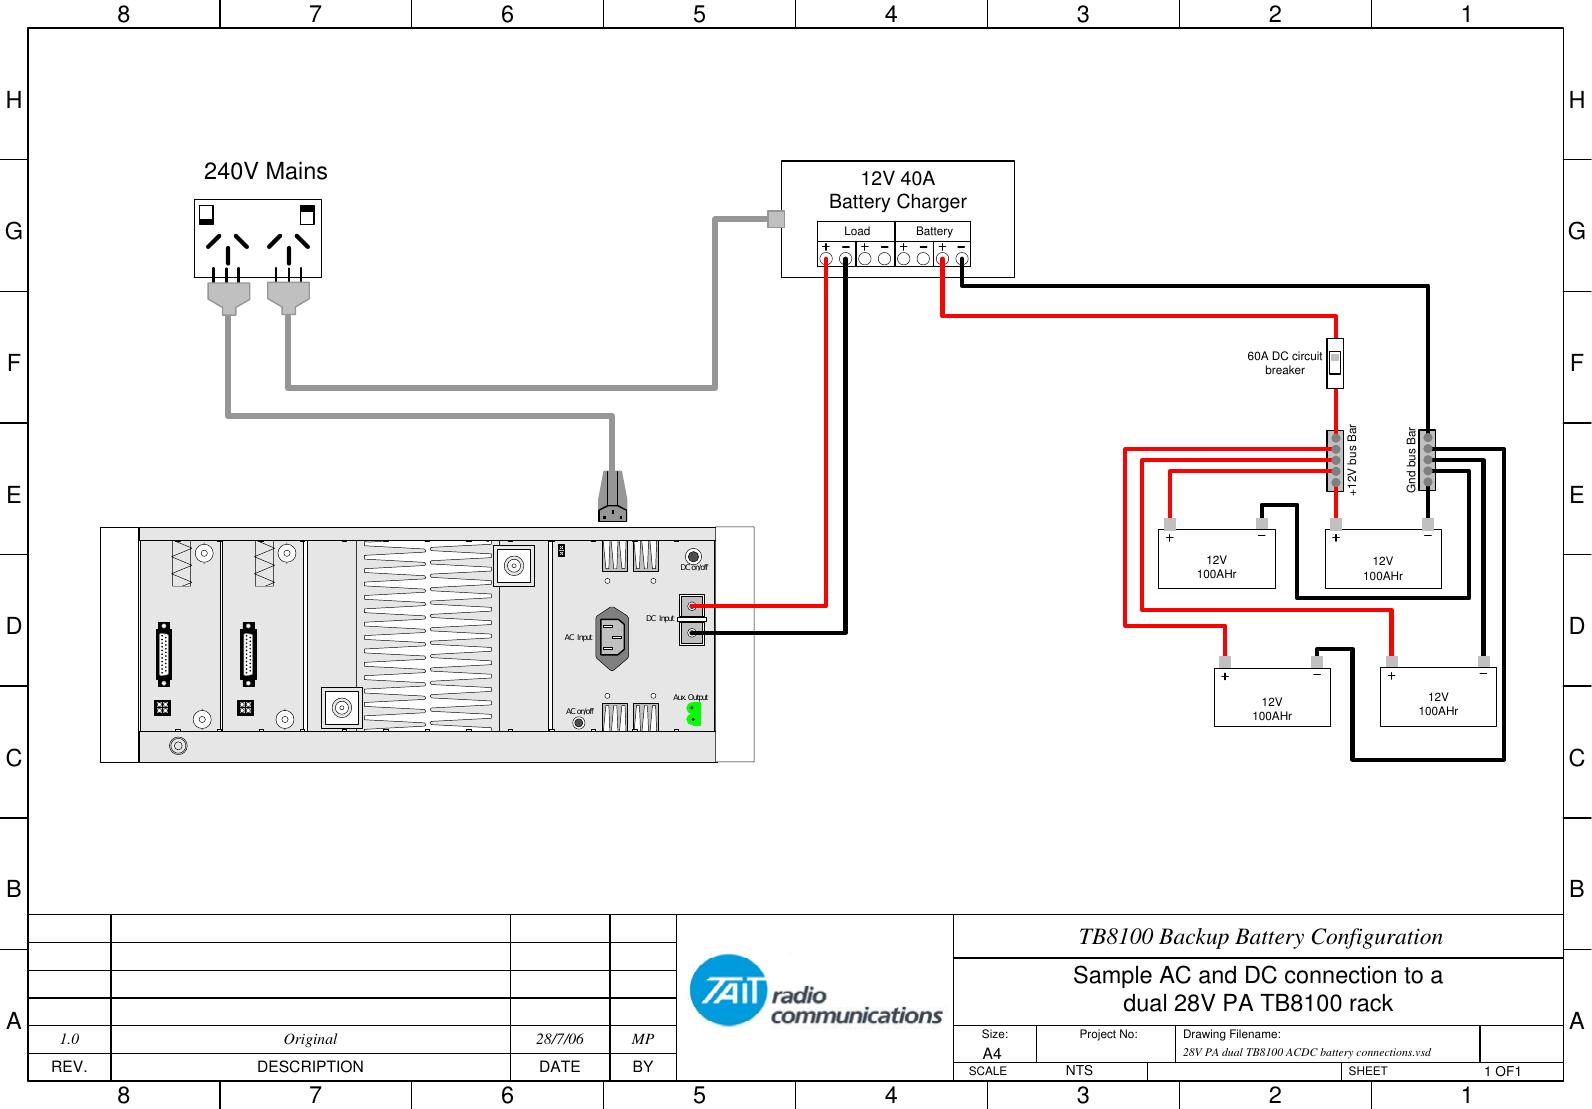 AN022 01 Site Battery Charging TB8100 Tech Notes/Job